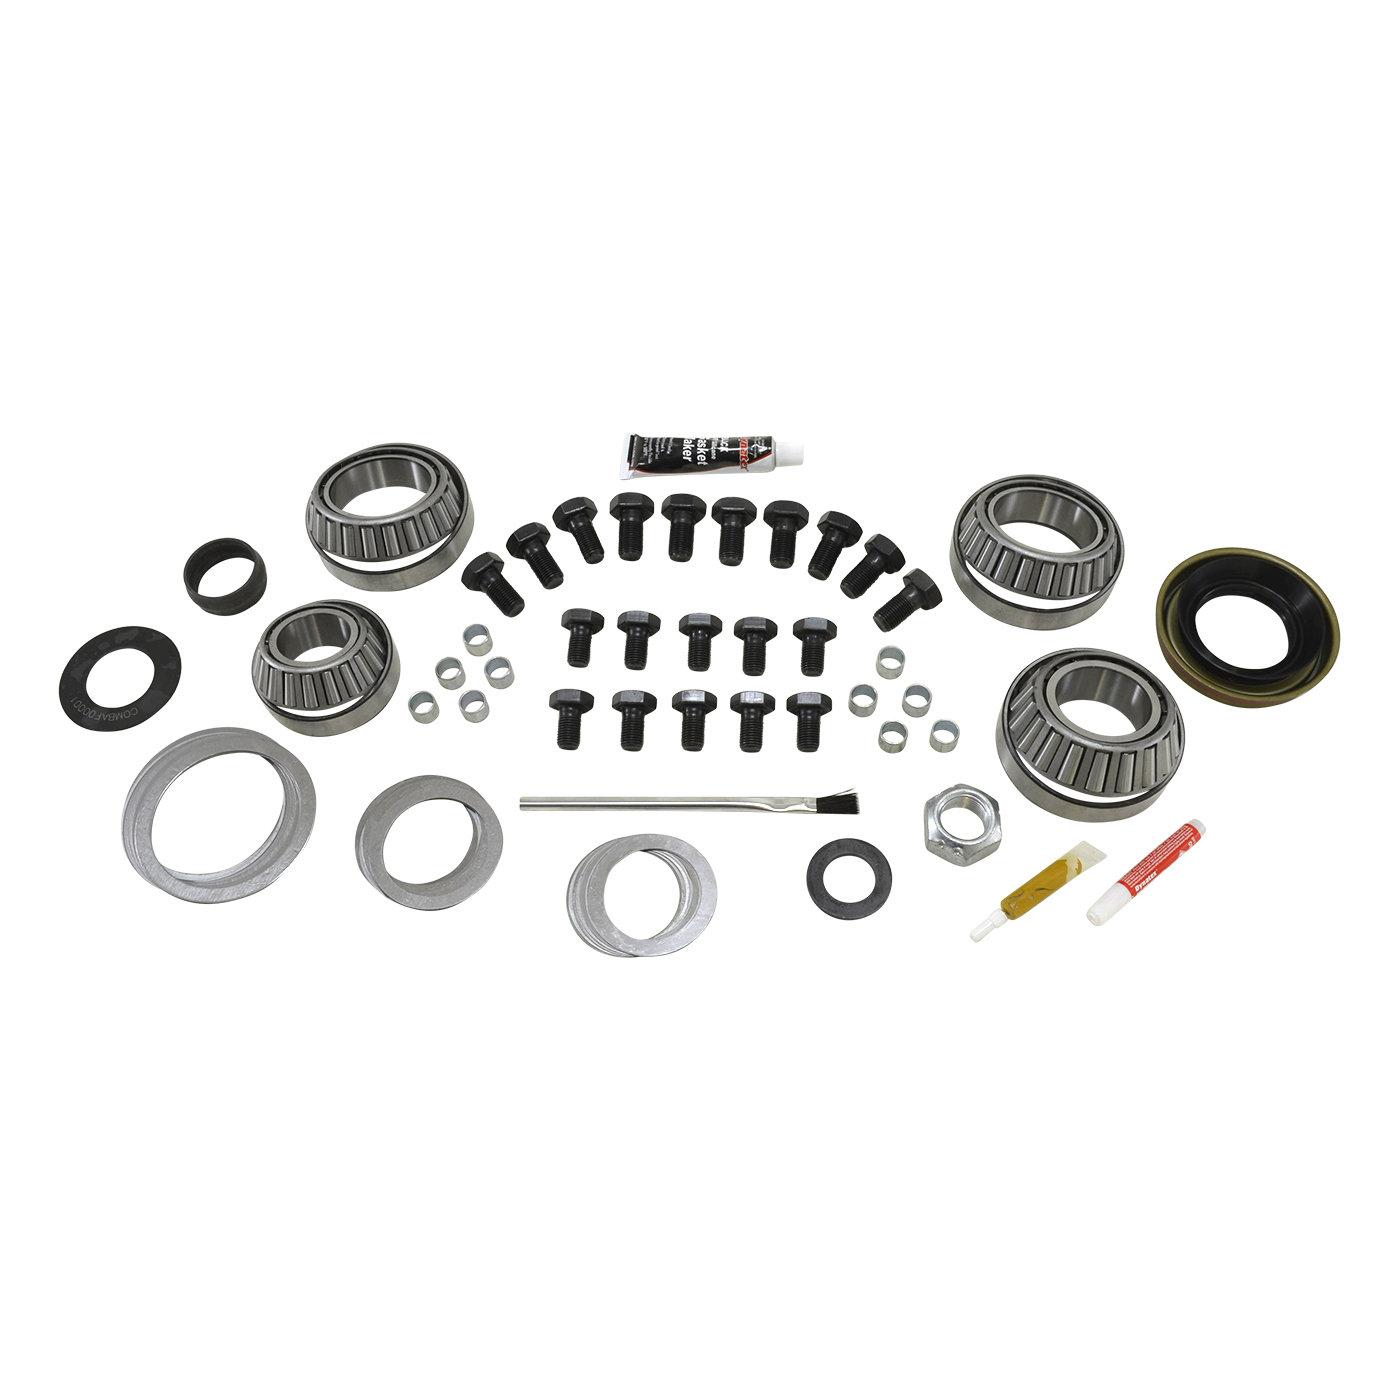 Yukon Gear & Axle YK D44JL-REAR Master Ring & Pinion